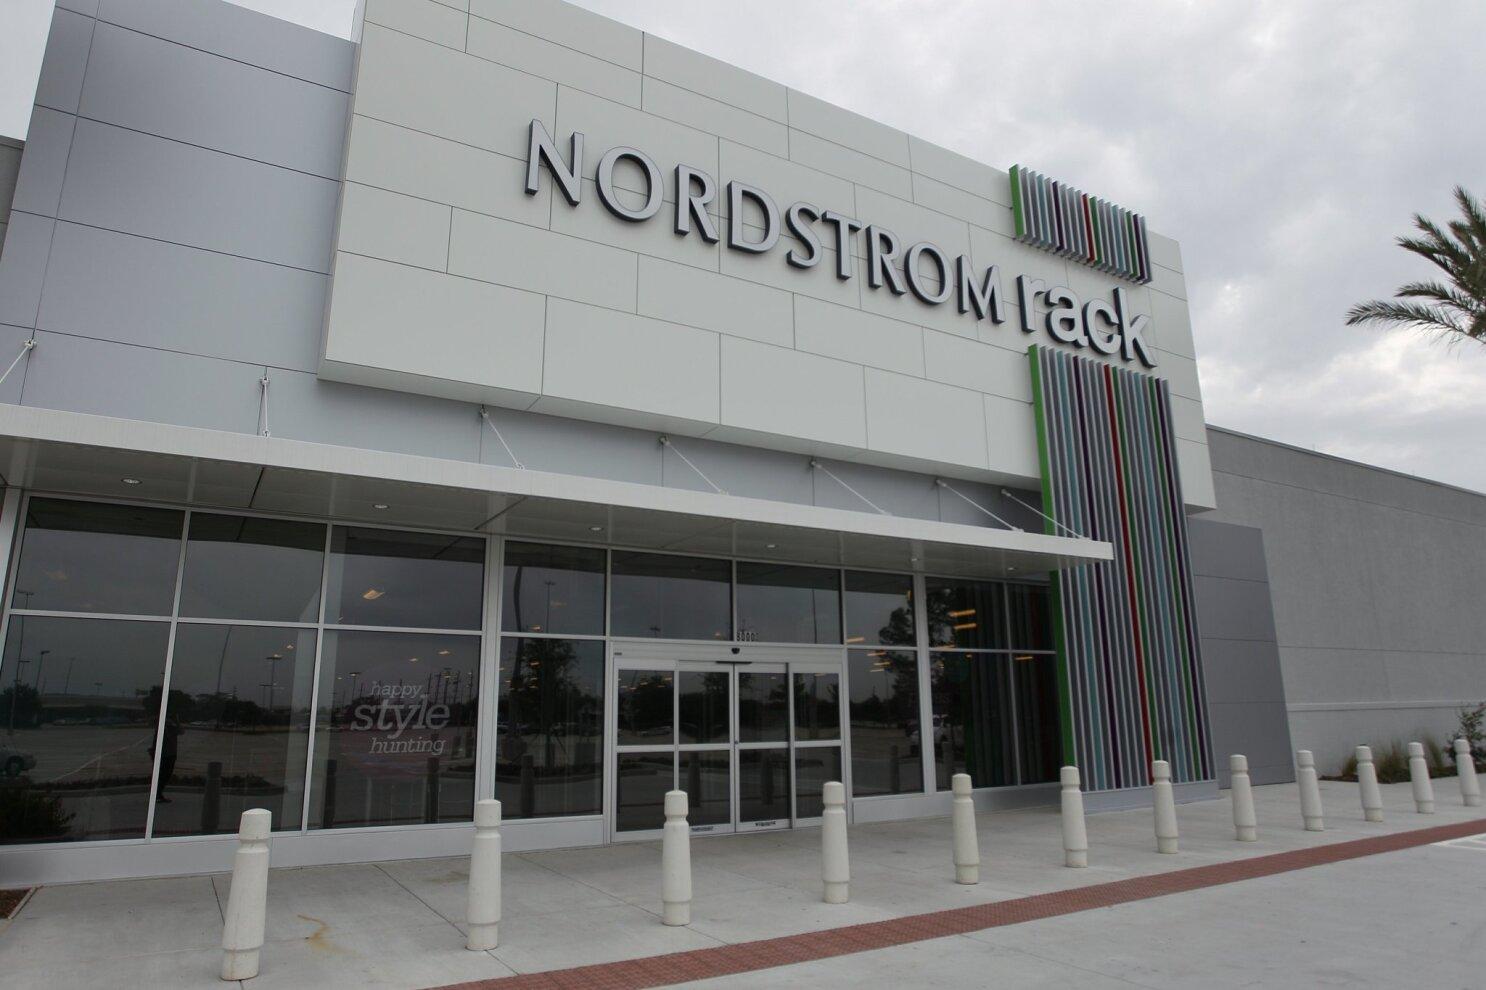 572effd27339 Nordstrom Rack comes to La Jolla - The San Diego Union-Tribune